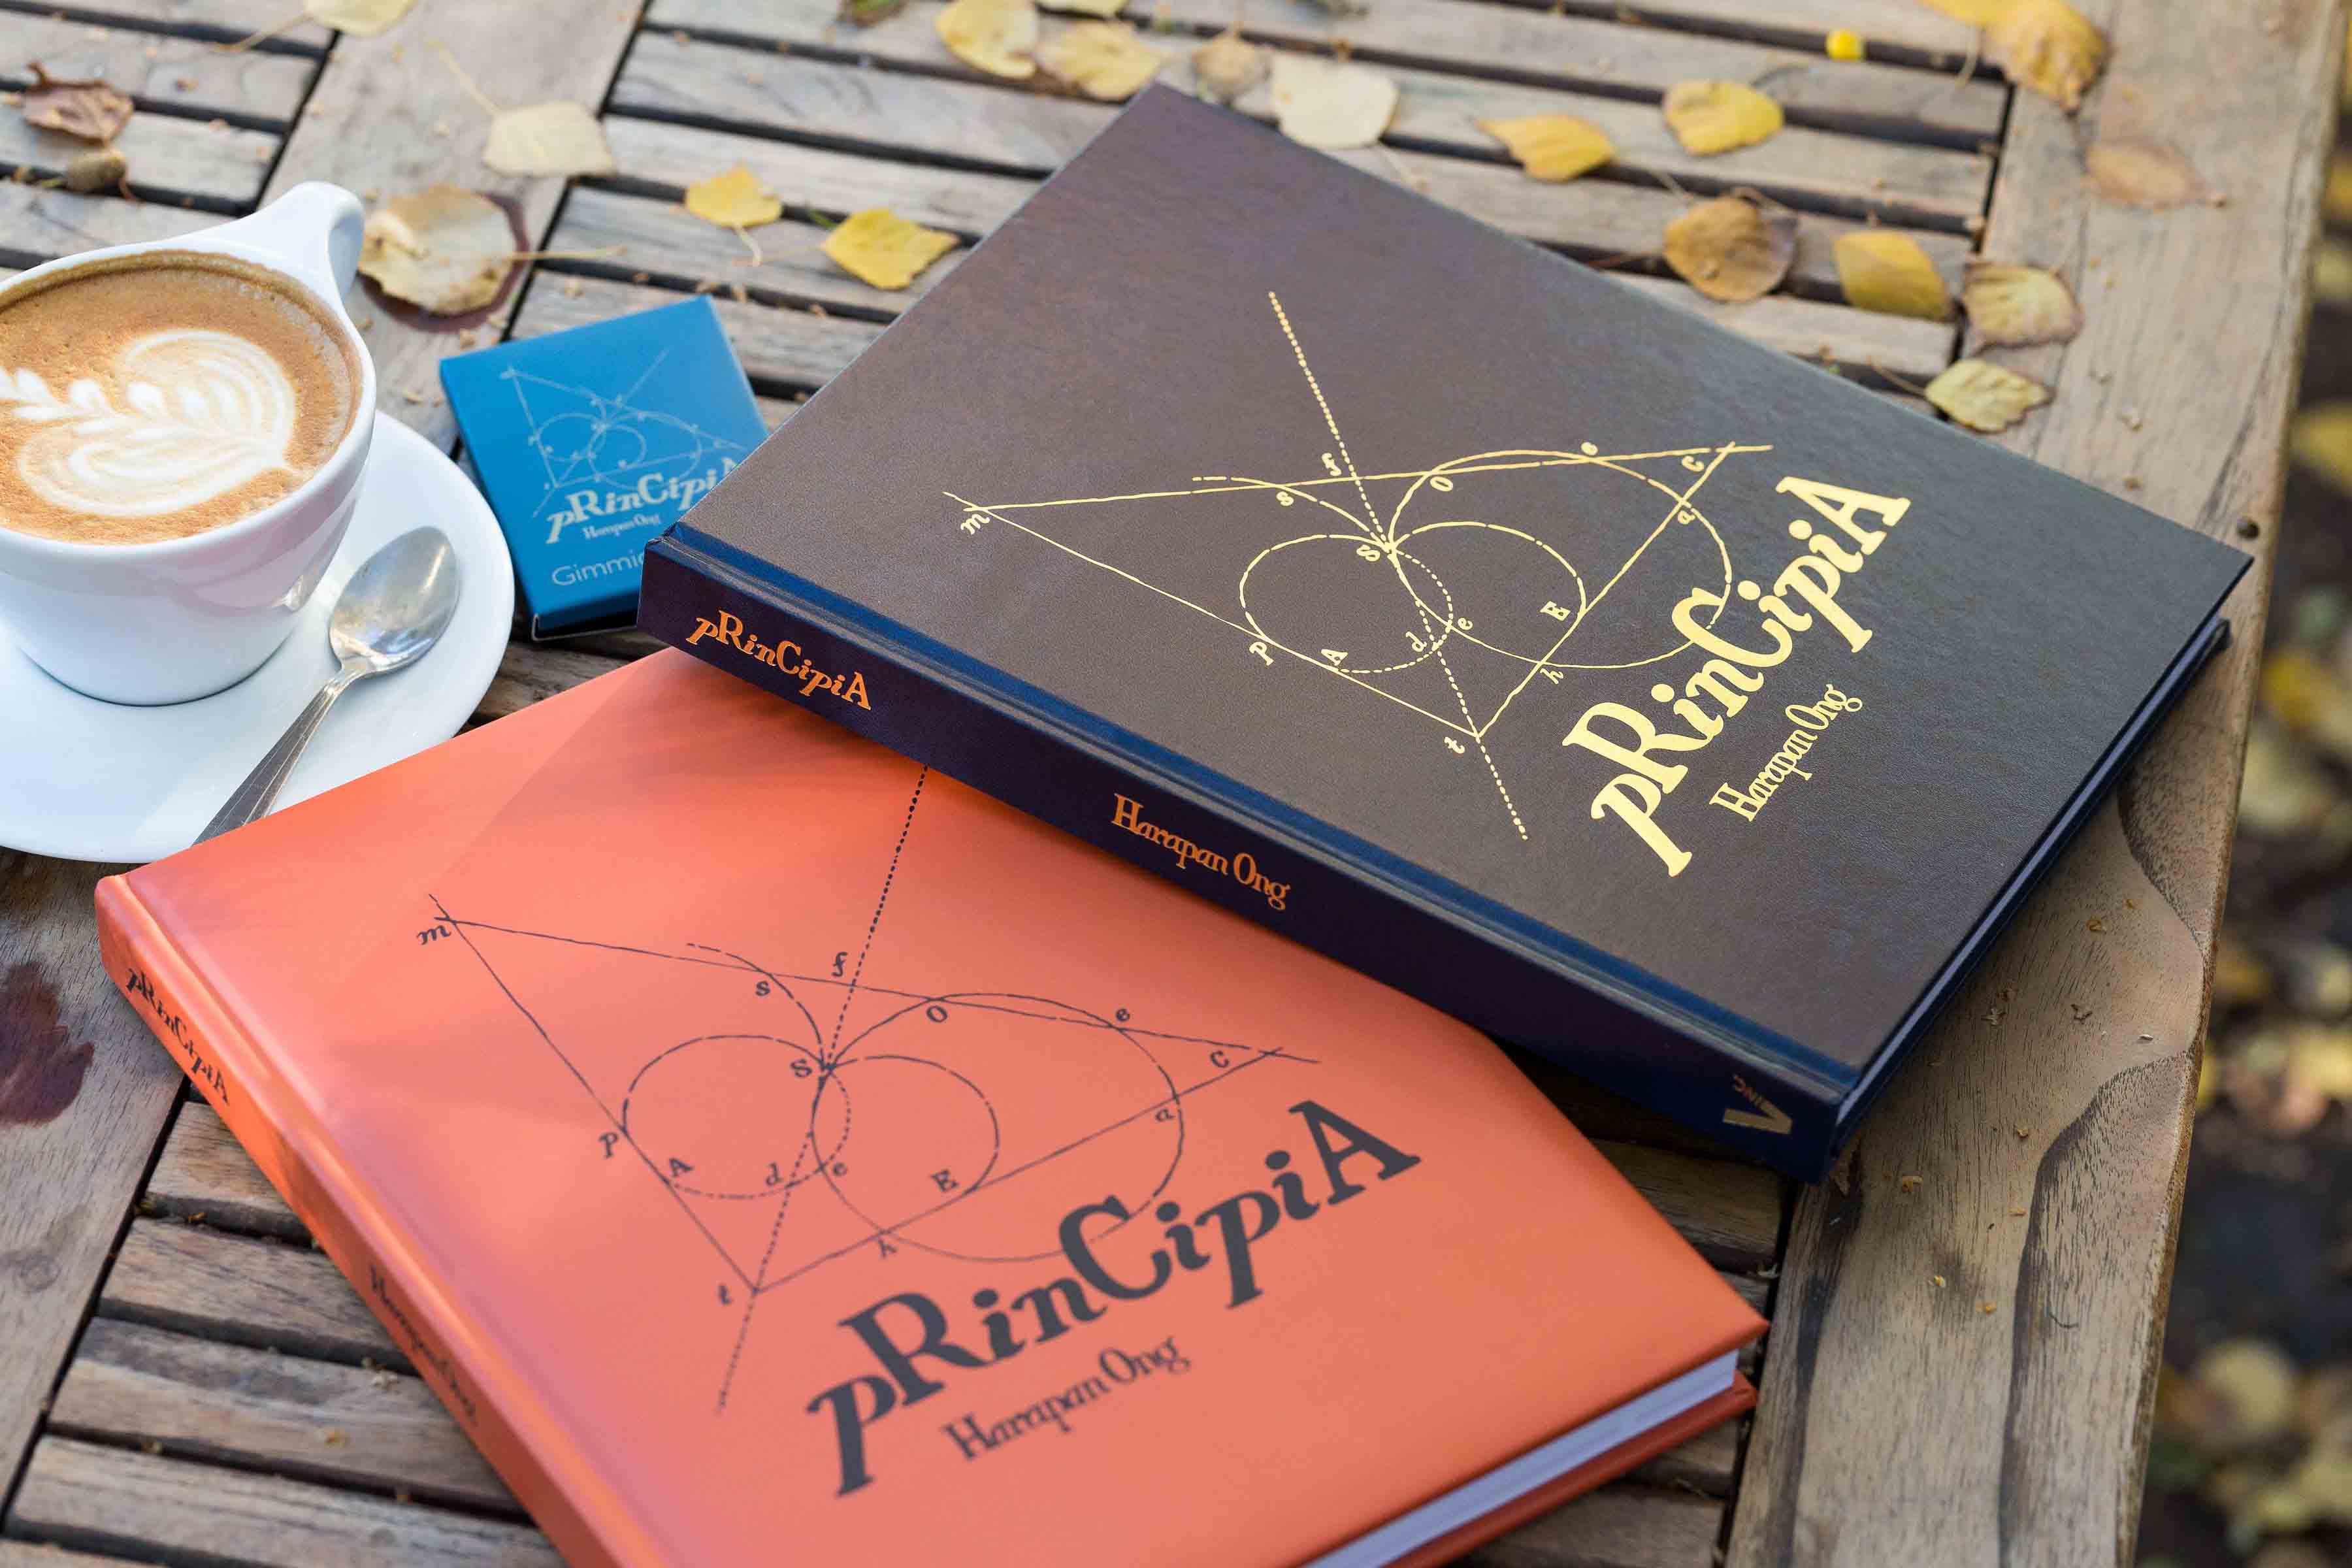 Principia (with gimmicks) - Harapan Ong - Vanishing Inc. Magic shop